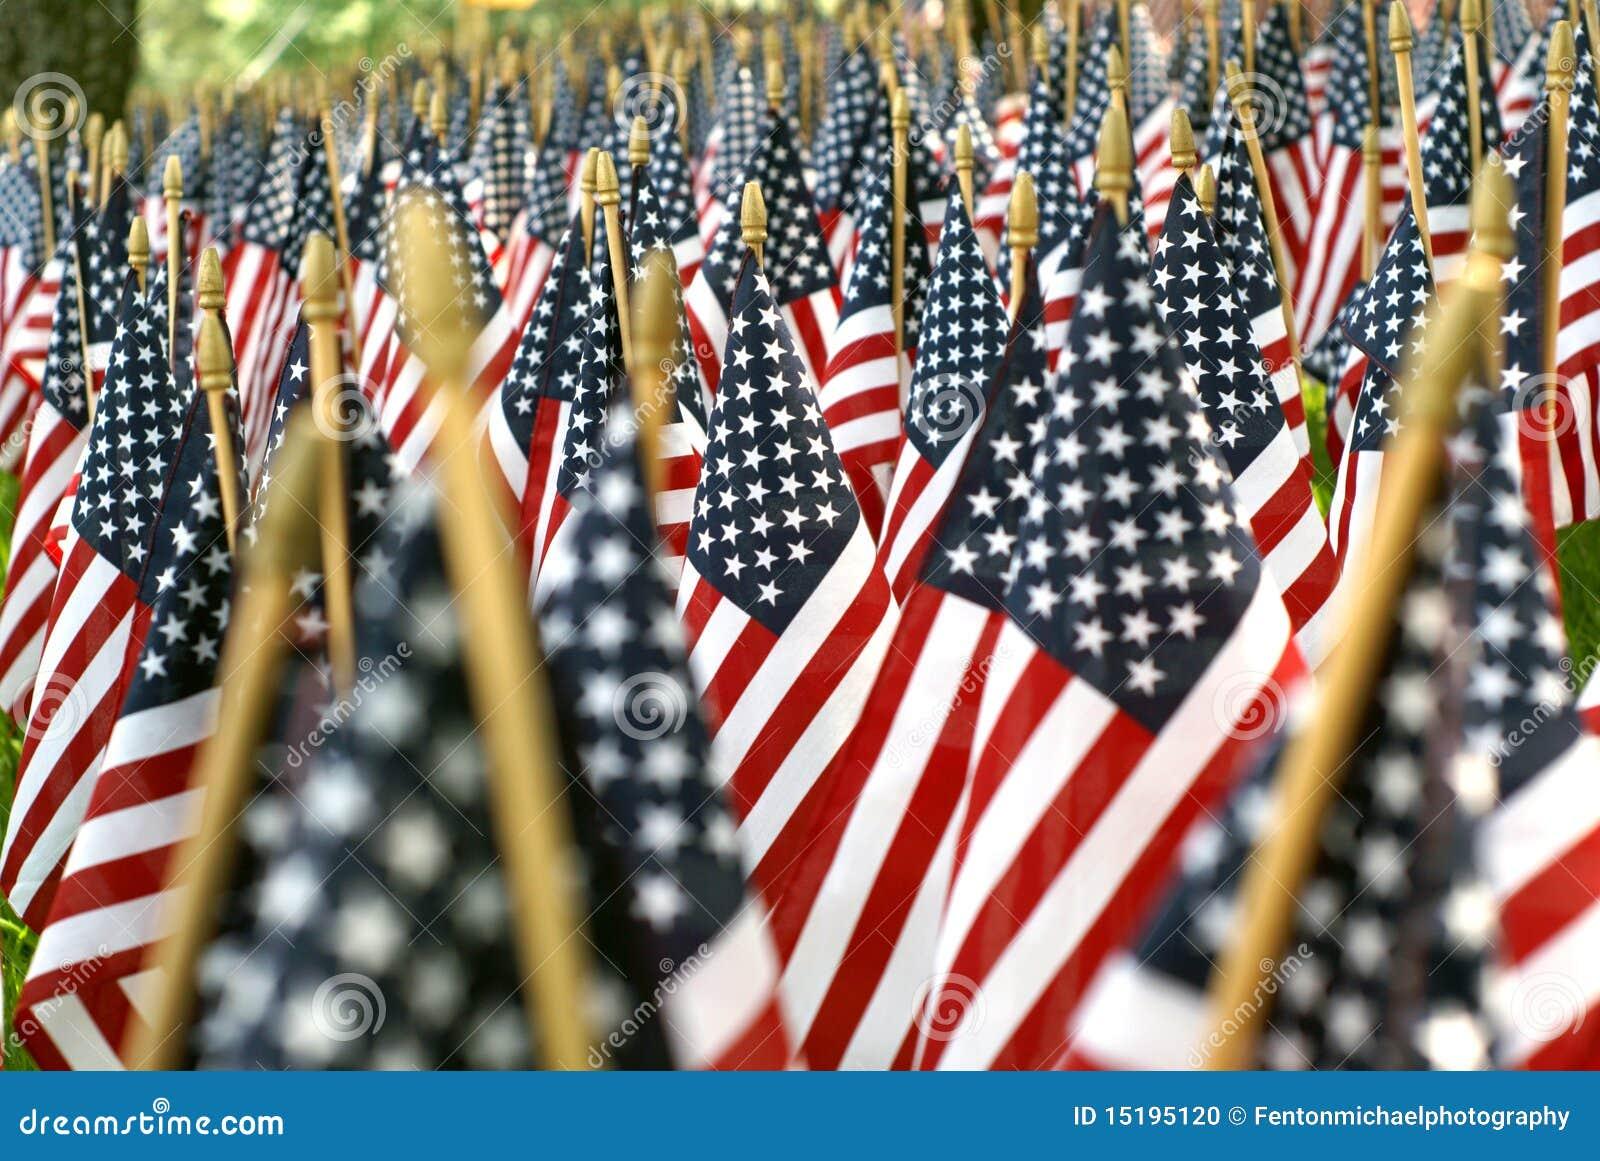 02608 amerikanska fältflaggor